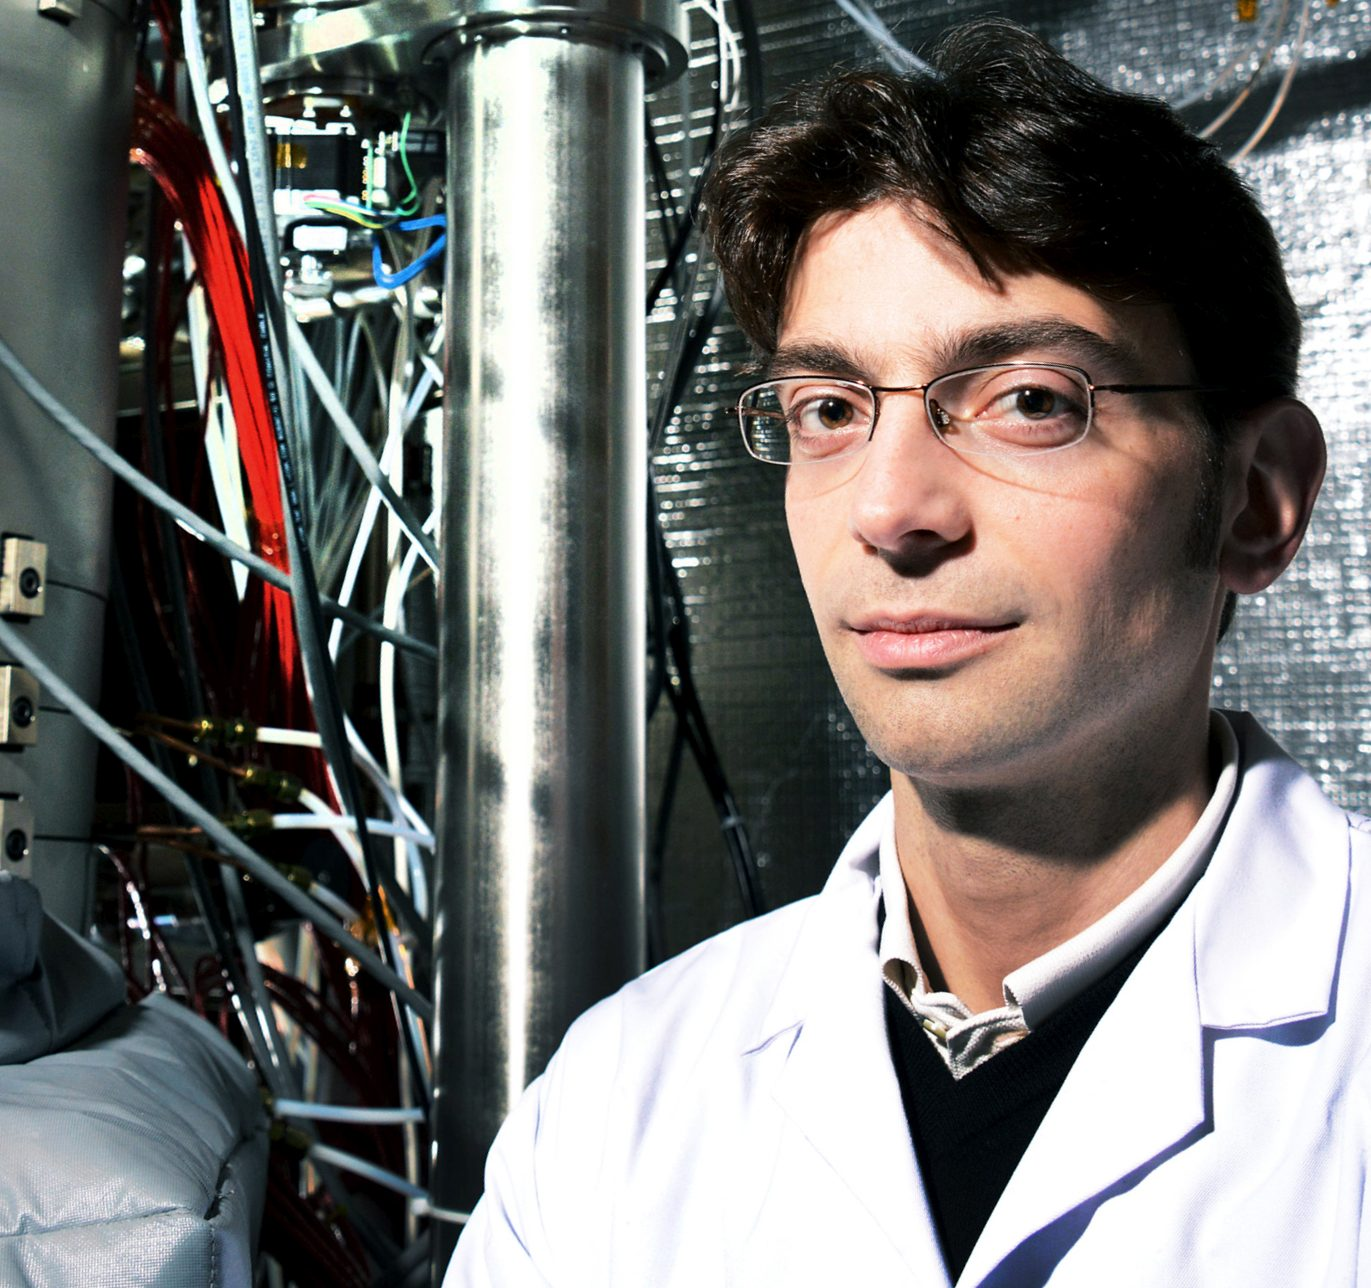 Professor Quentin Ramasse